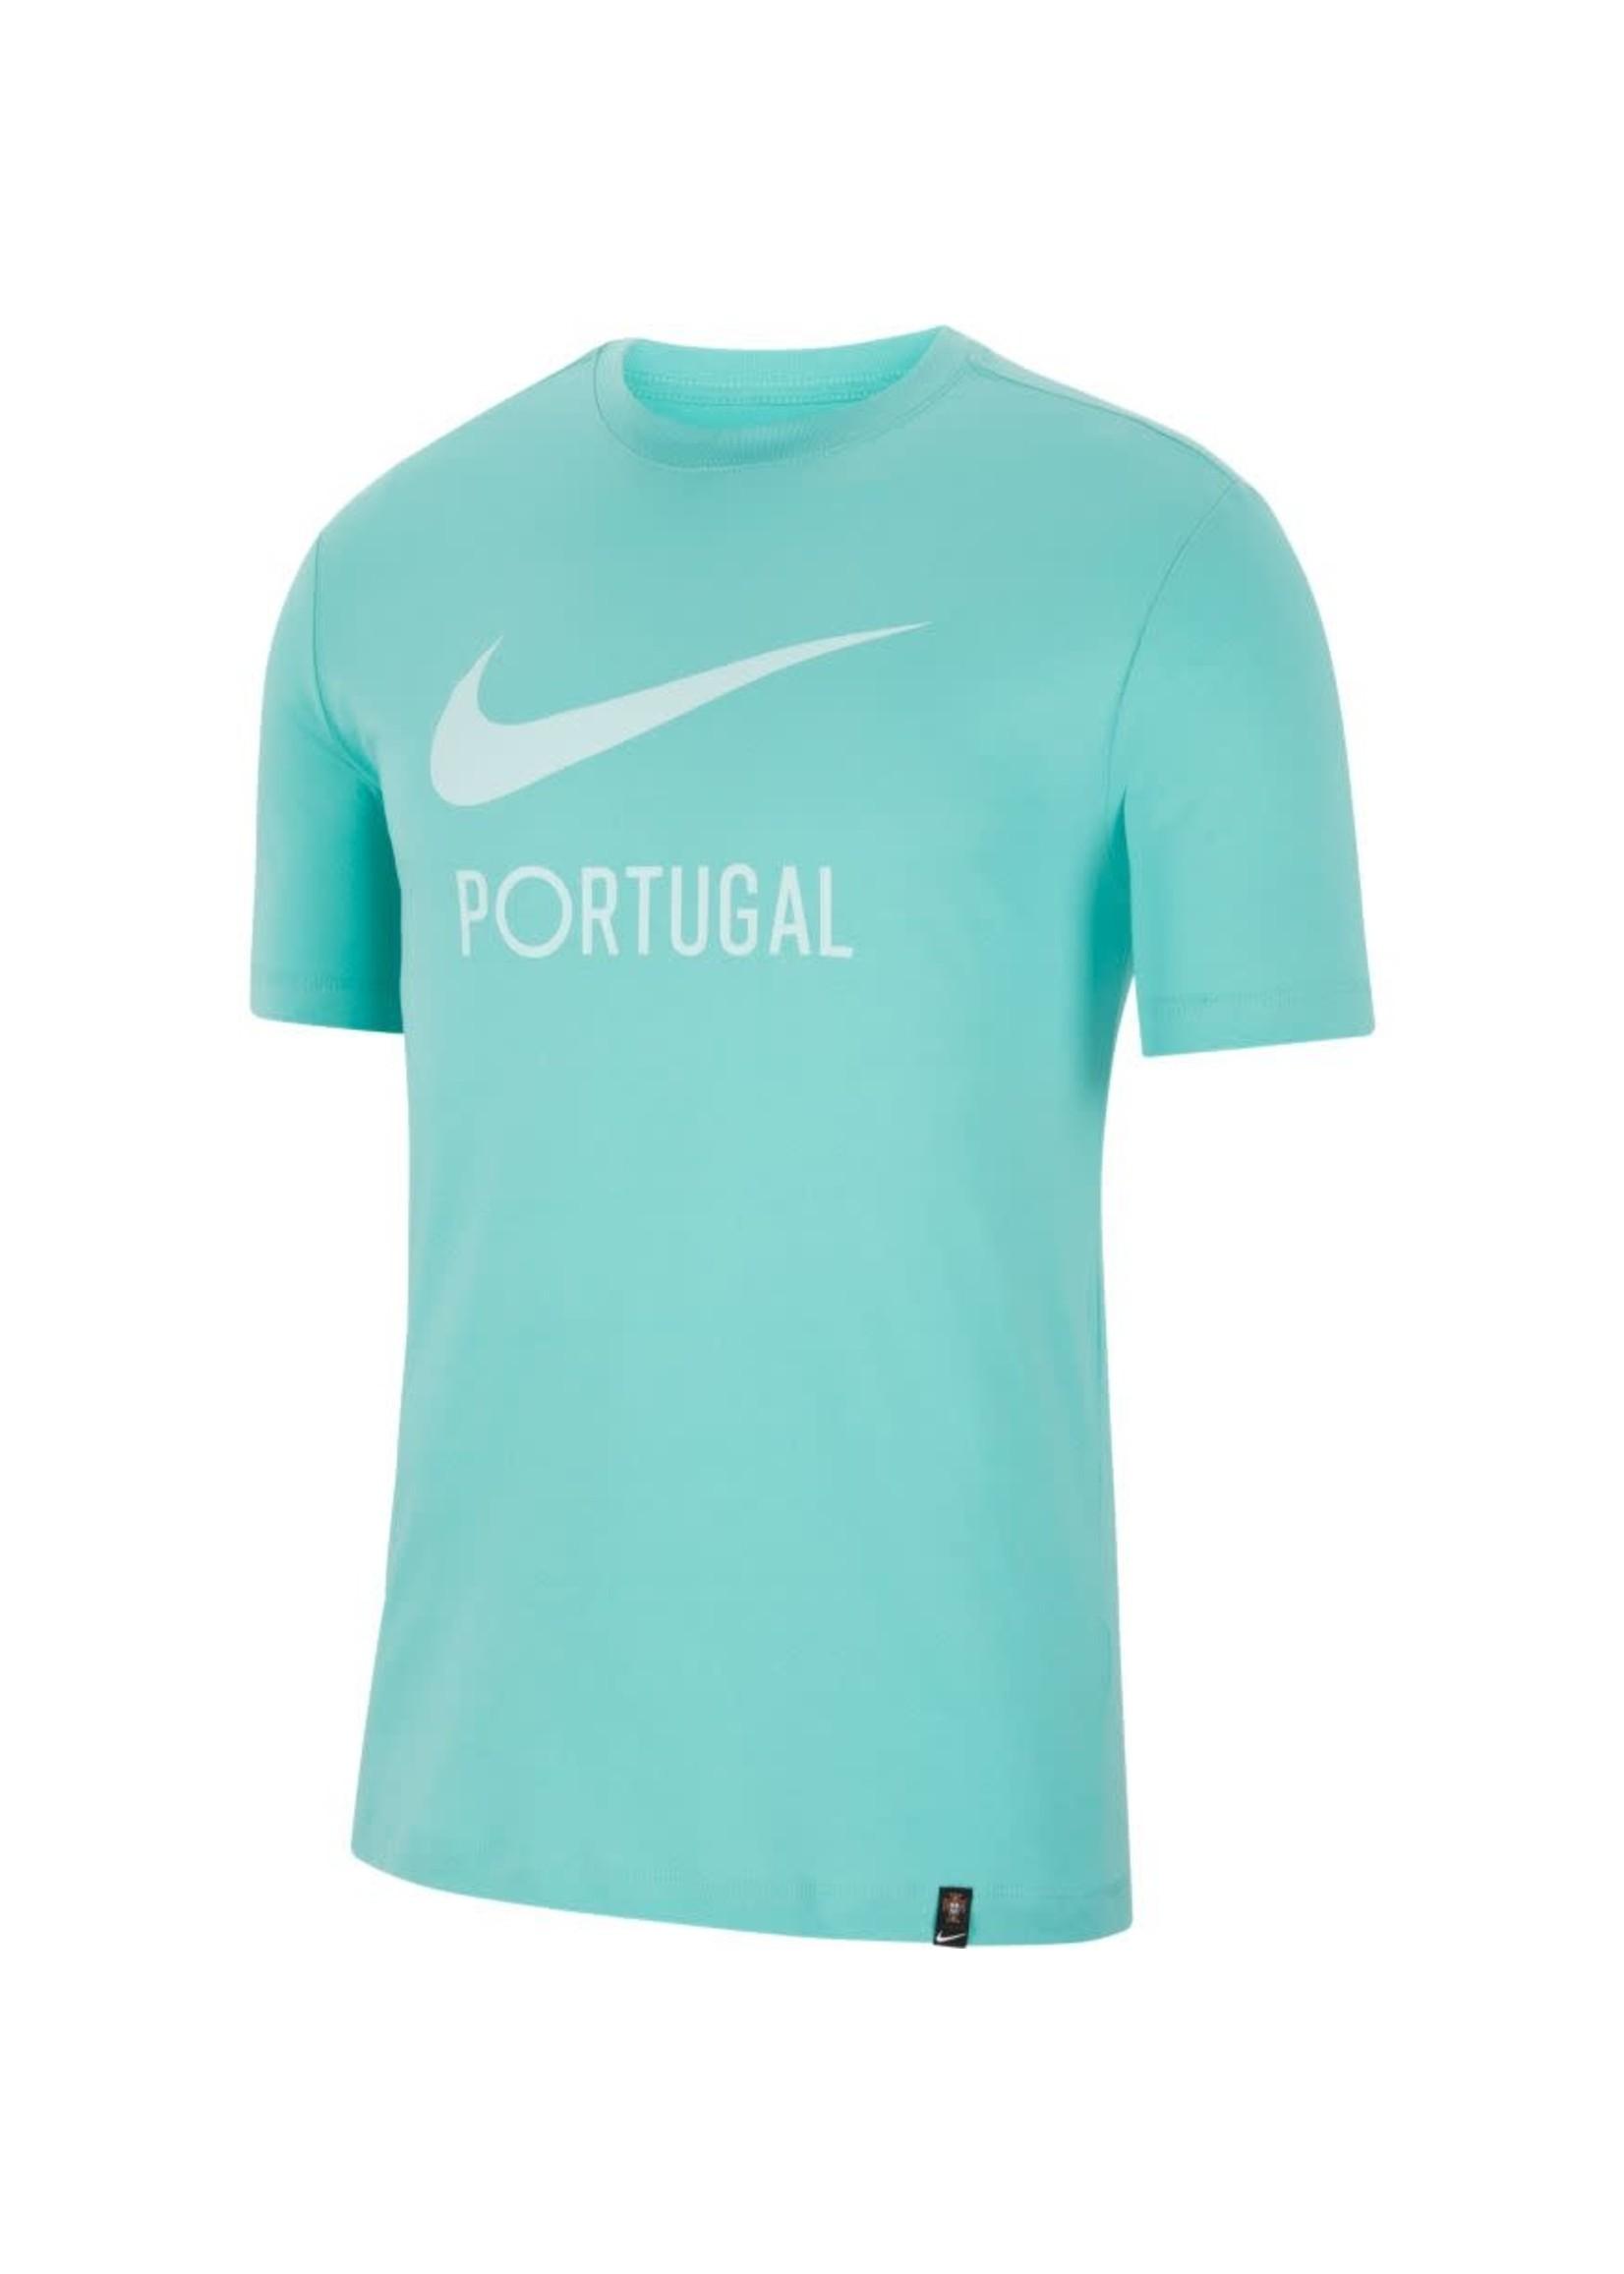 Nike Portugal T-Shirt - Away